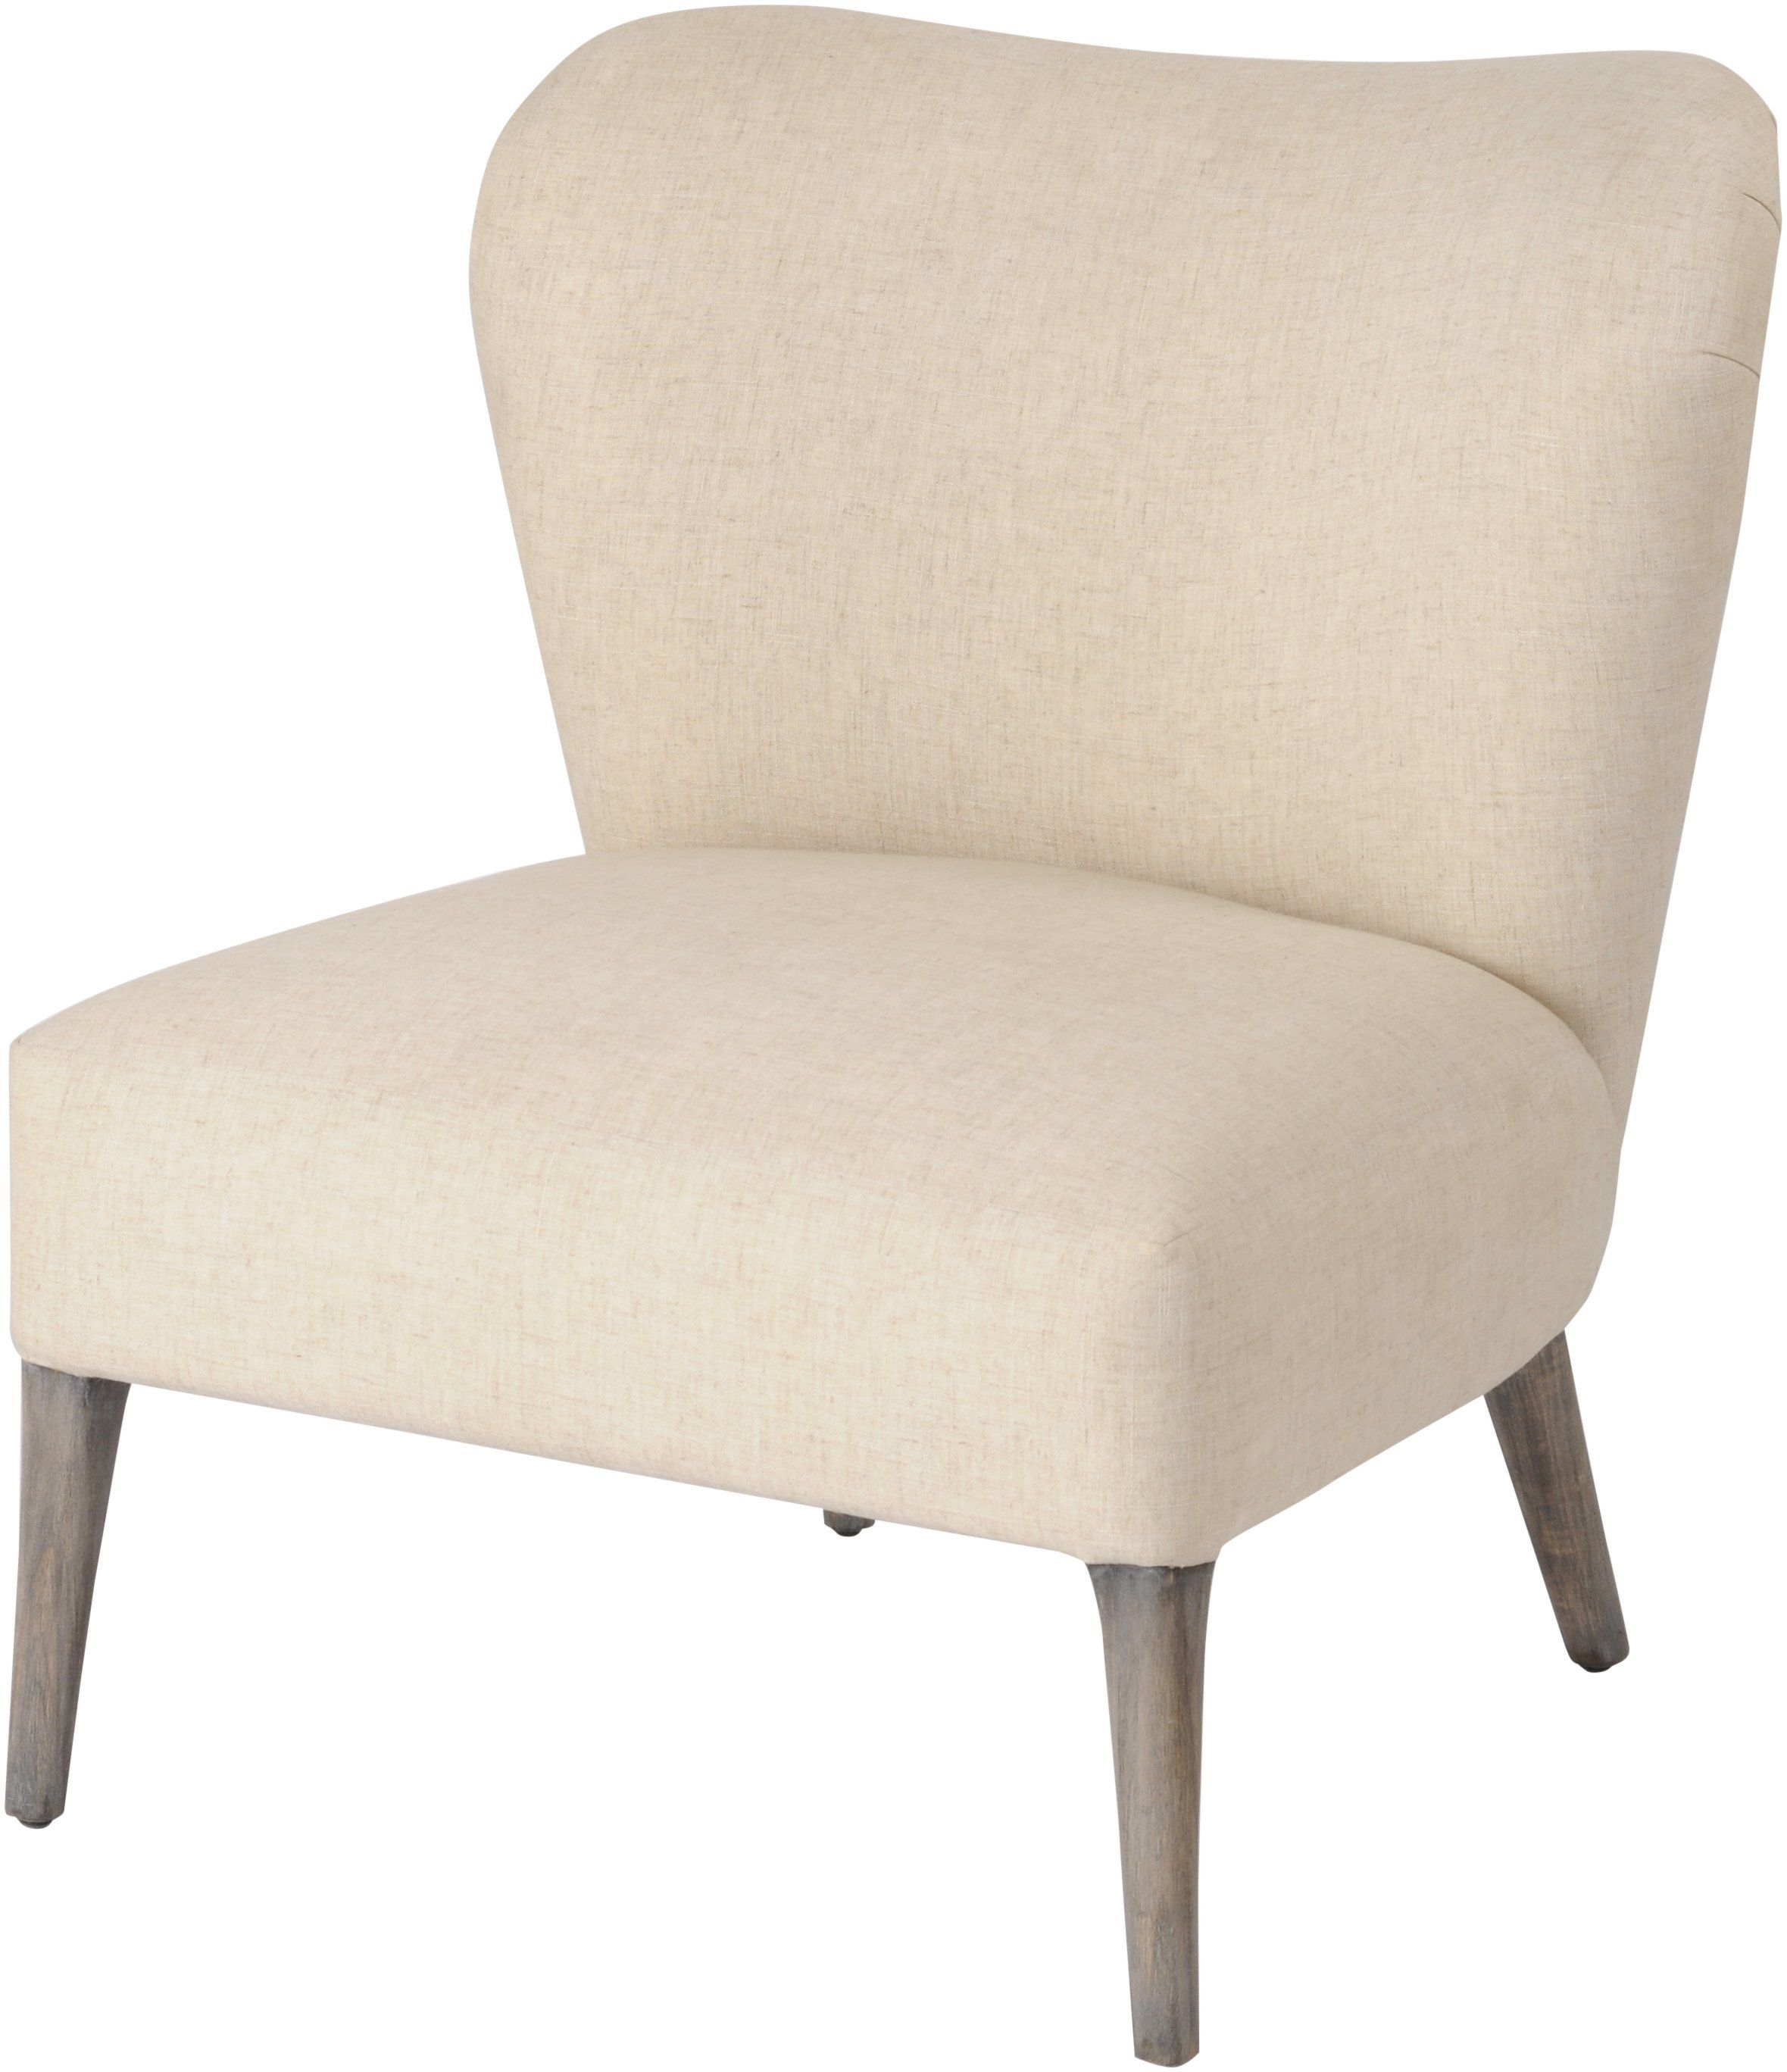 Homestead Cream Linen Mindi Occasional Chair Allissias Attic